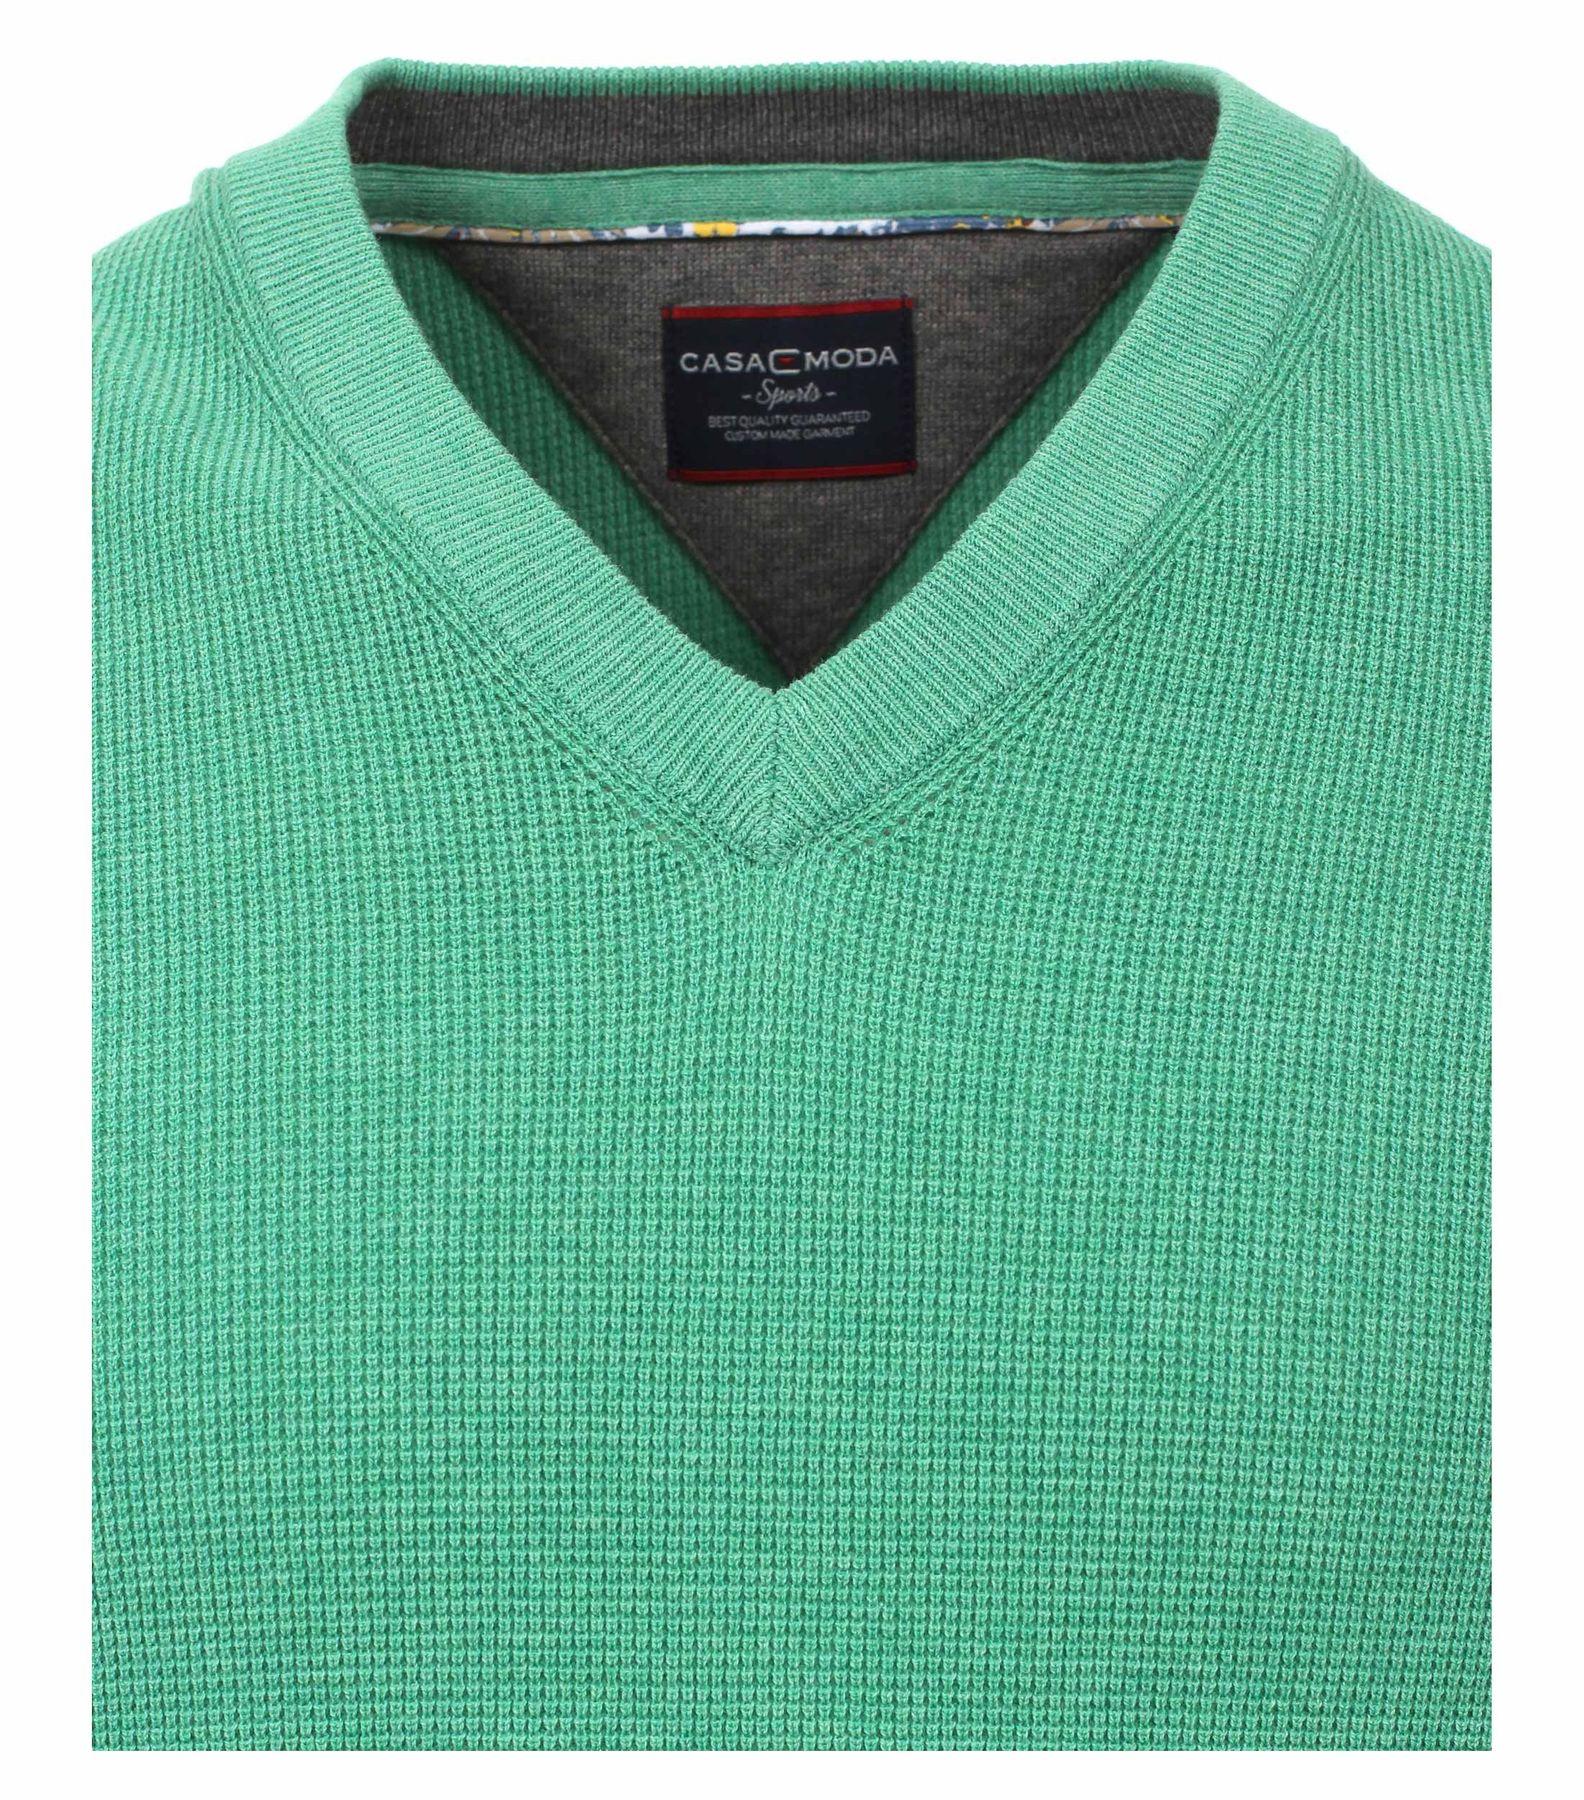 Casa Moda - Unifarbener Herren Pullover mit V-Ausschnitt  (472625000) – Bild 9